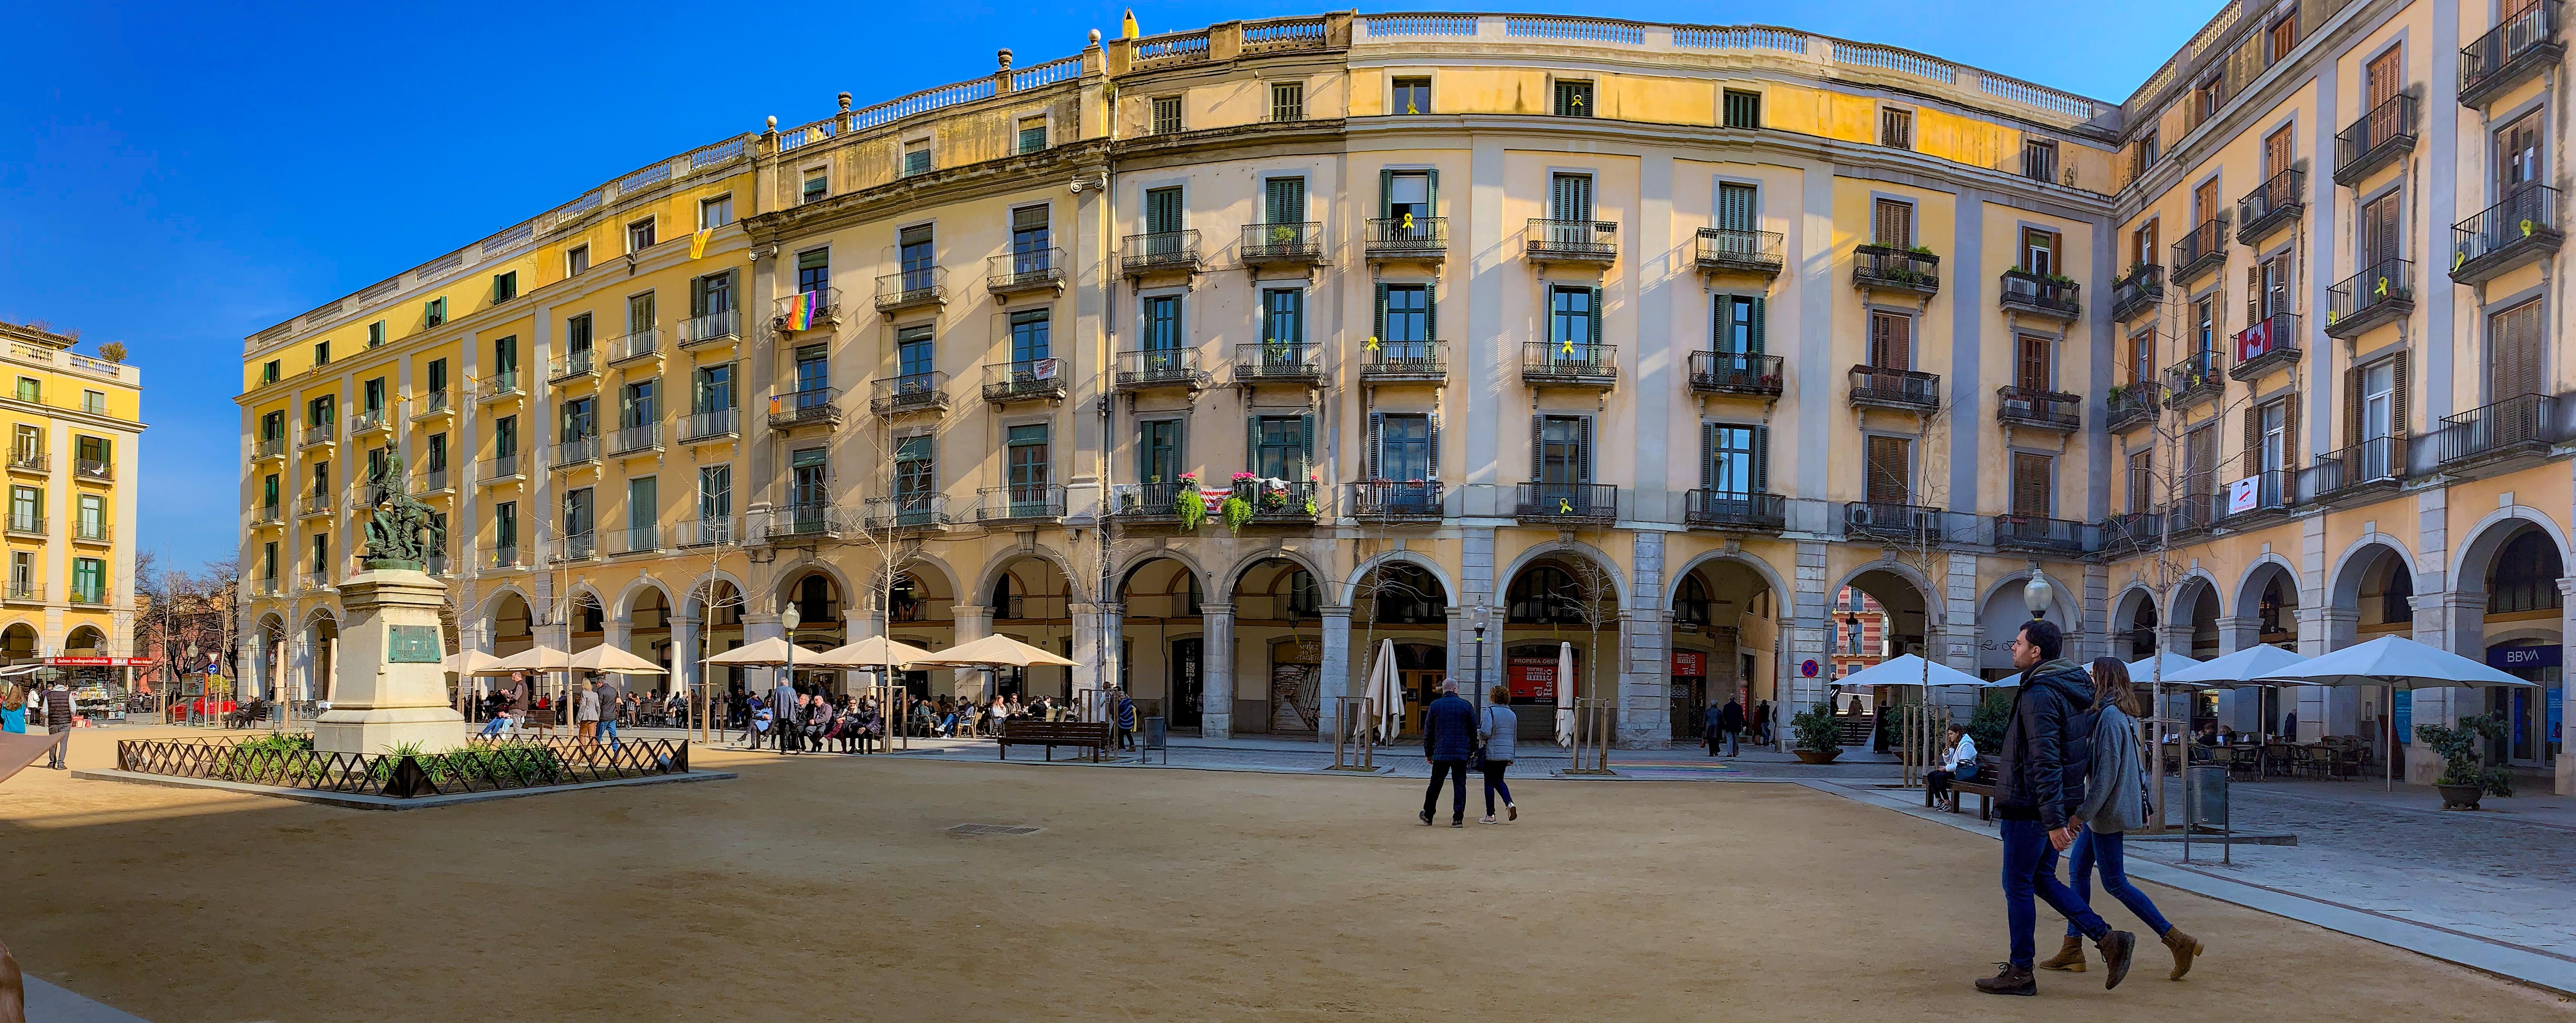 Girona: One Historic Day in Catalonia, Spain | Day Trips from Barcelona | A Great Big Hunk of World | www.agreatbighunkofworld.com | Rambla de la Libertad